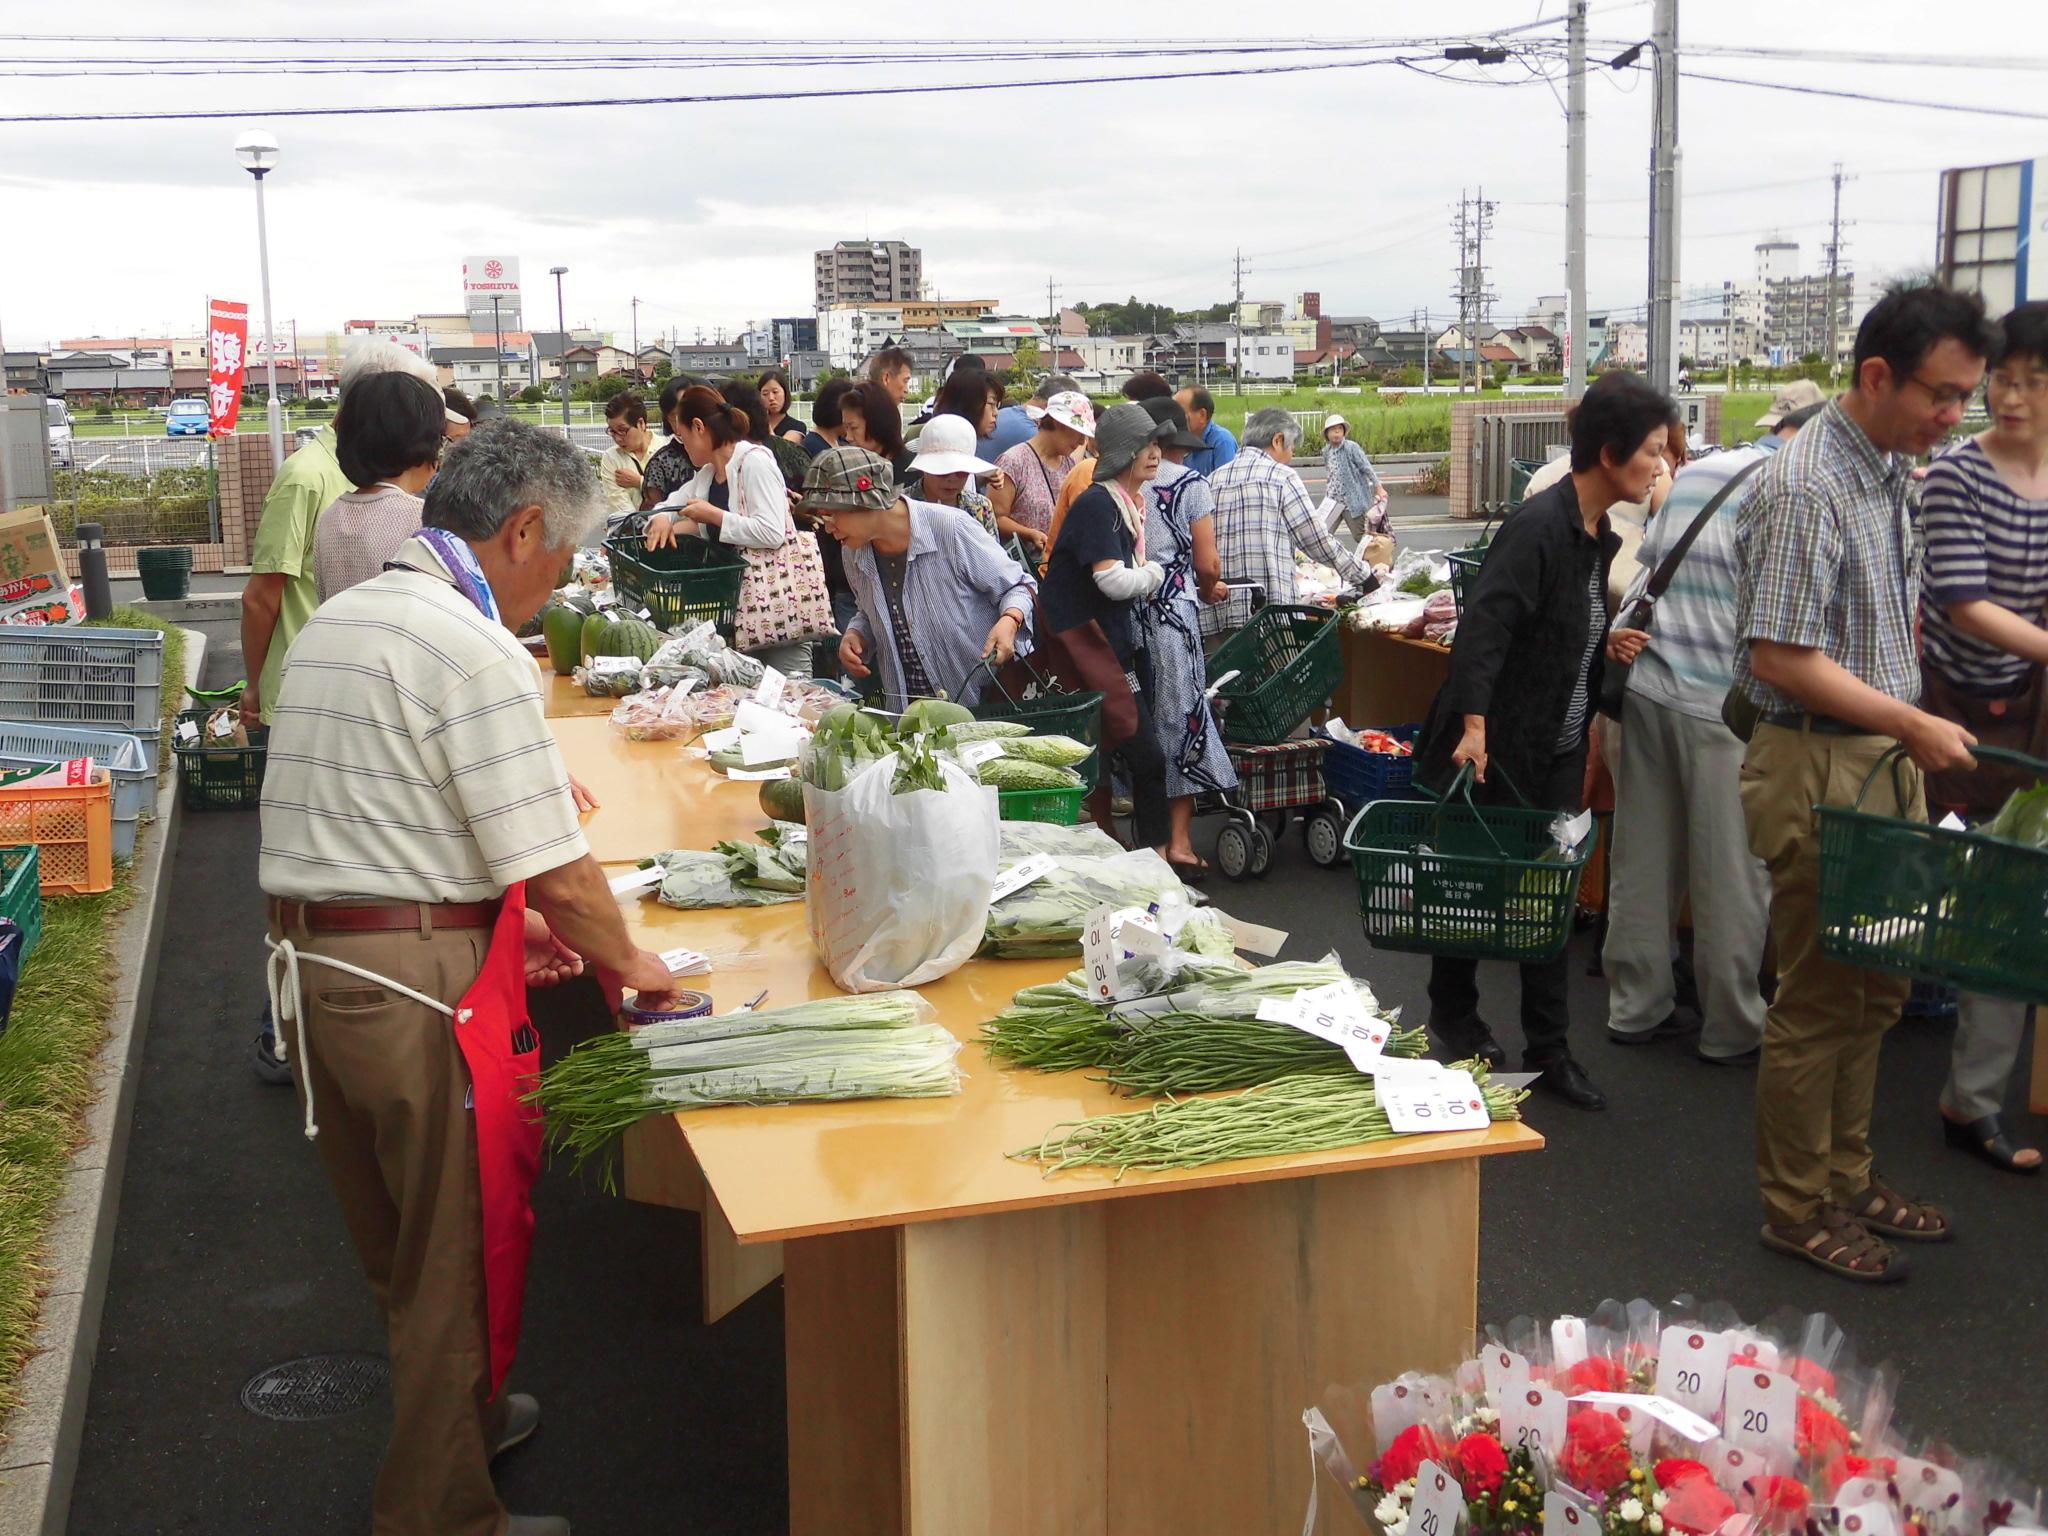 JA 海部東農業協同組合(あまひがし) -いきいき朝市甚目寺 一周年記念セールを開催